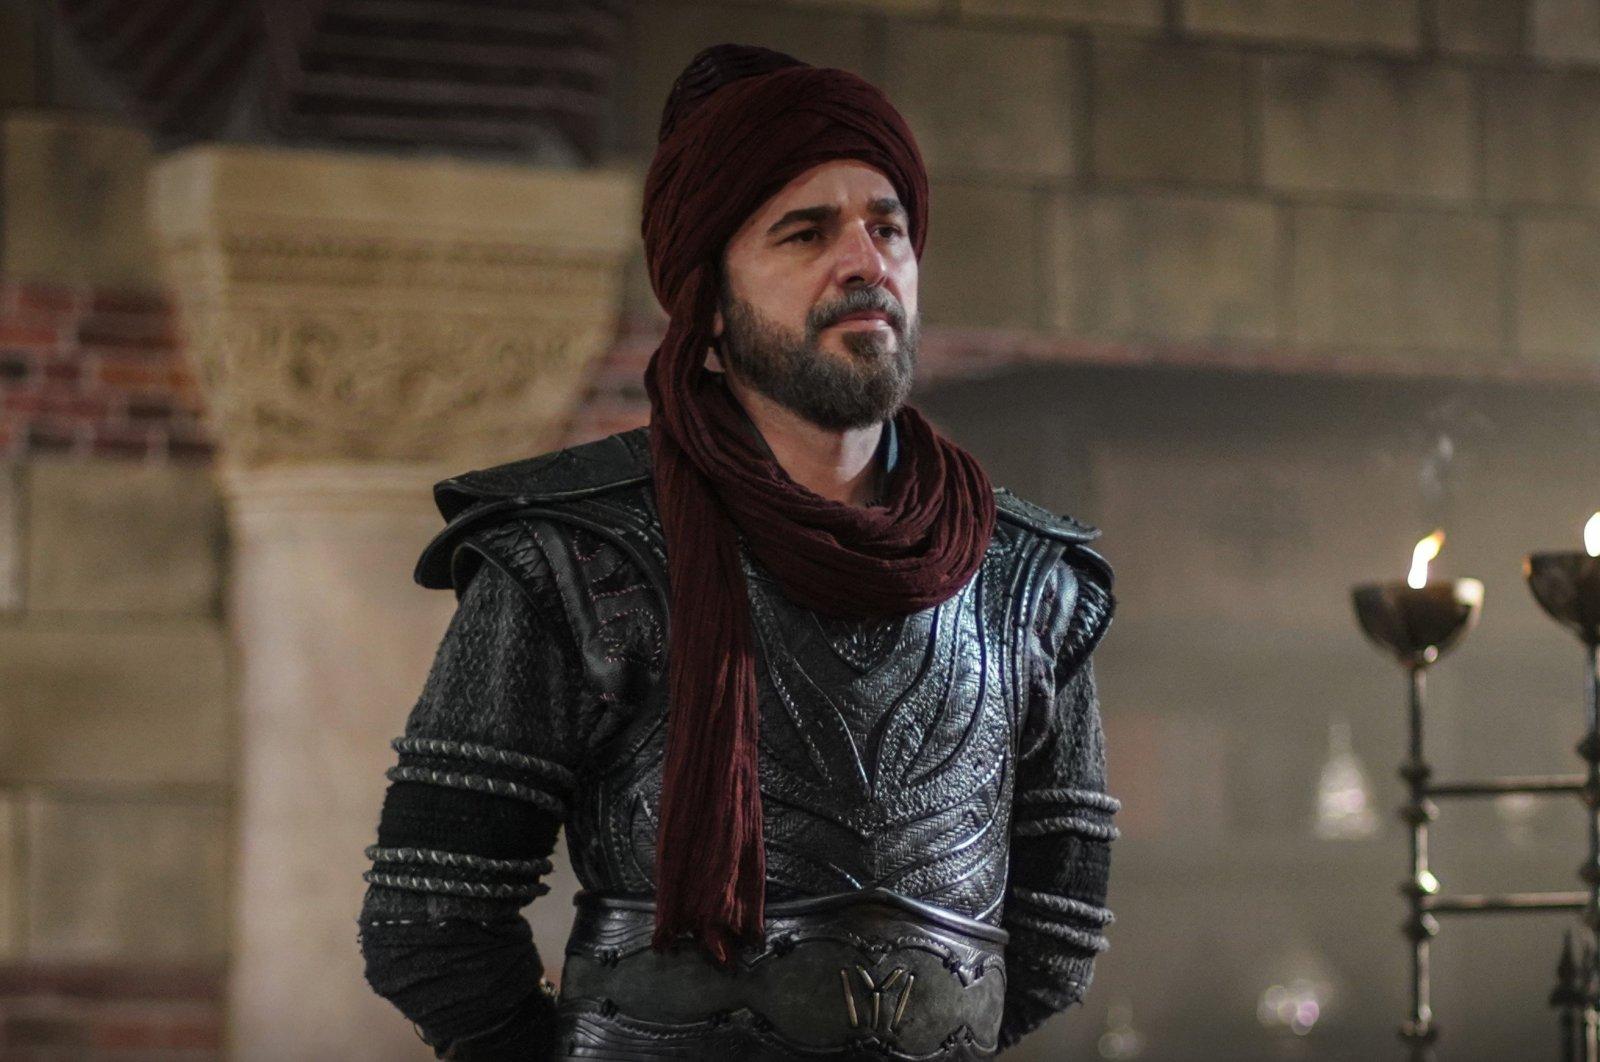 A still shot showing actor Engin Altan Düzyatan as Ertuğrul Gazi in the series.